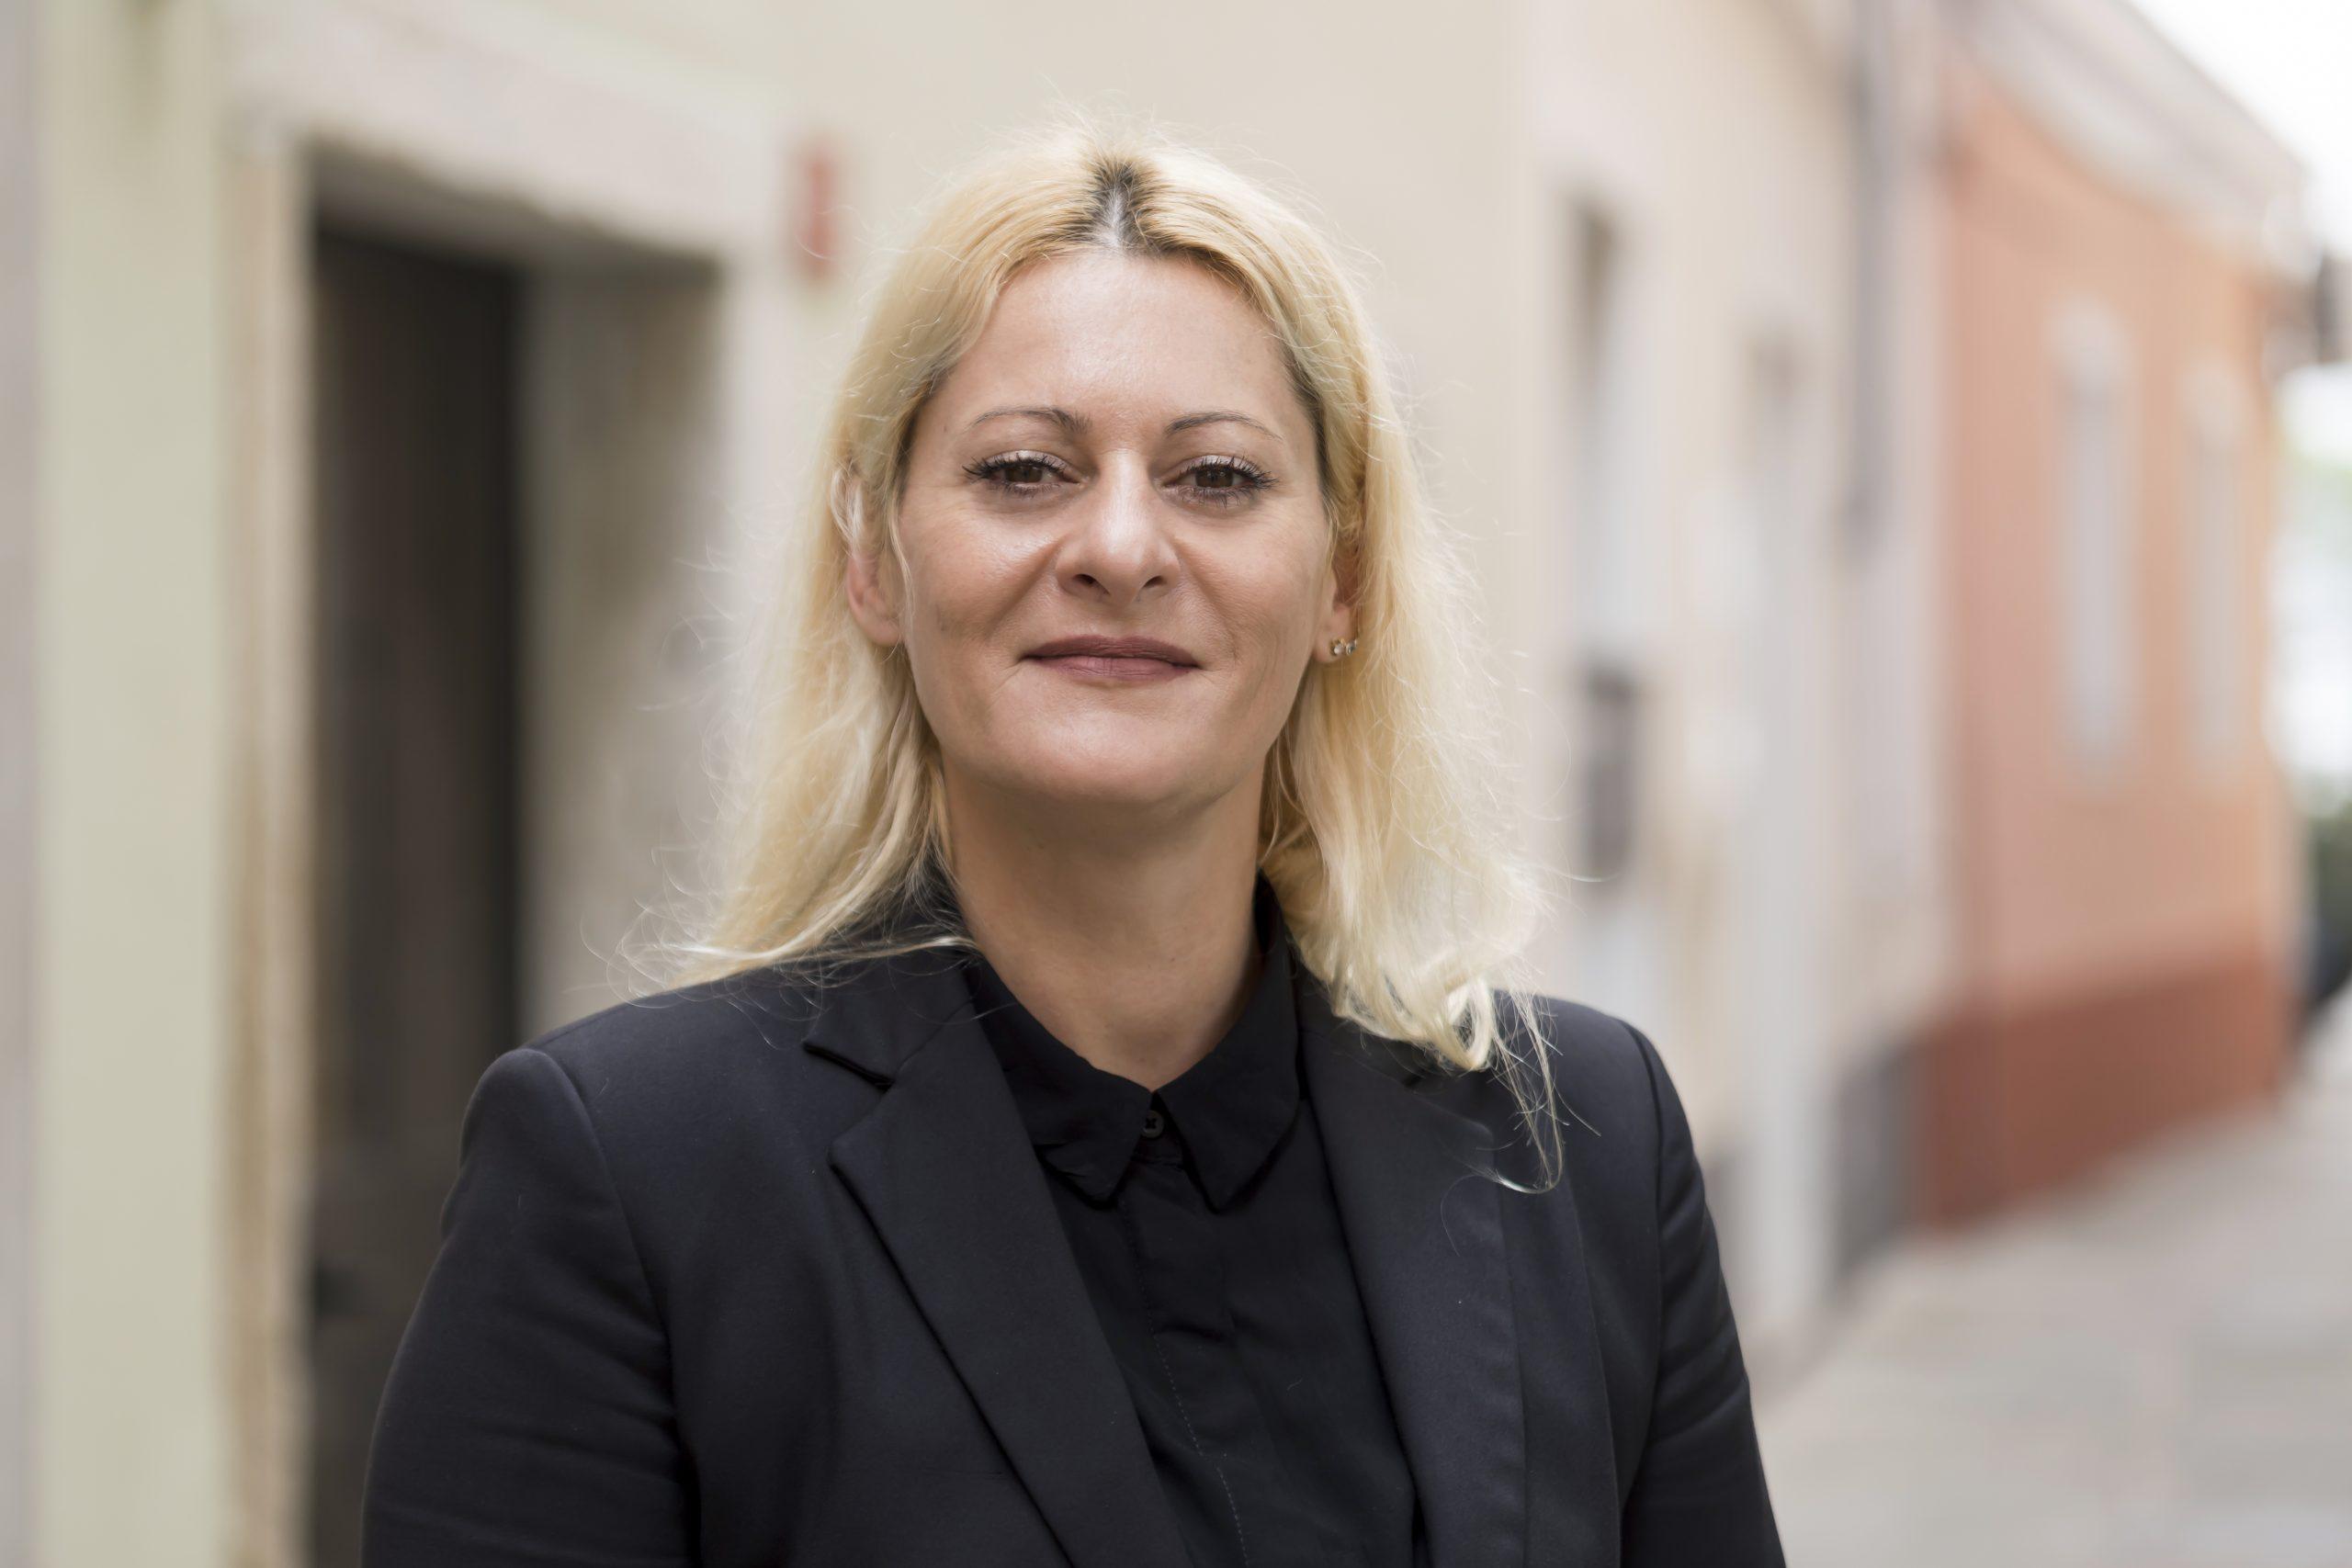 Linda Rotter